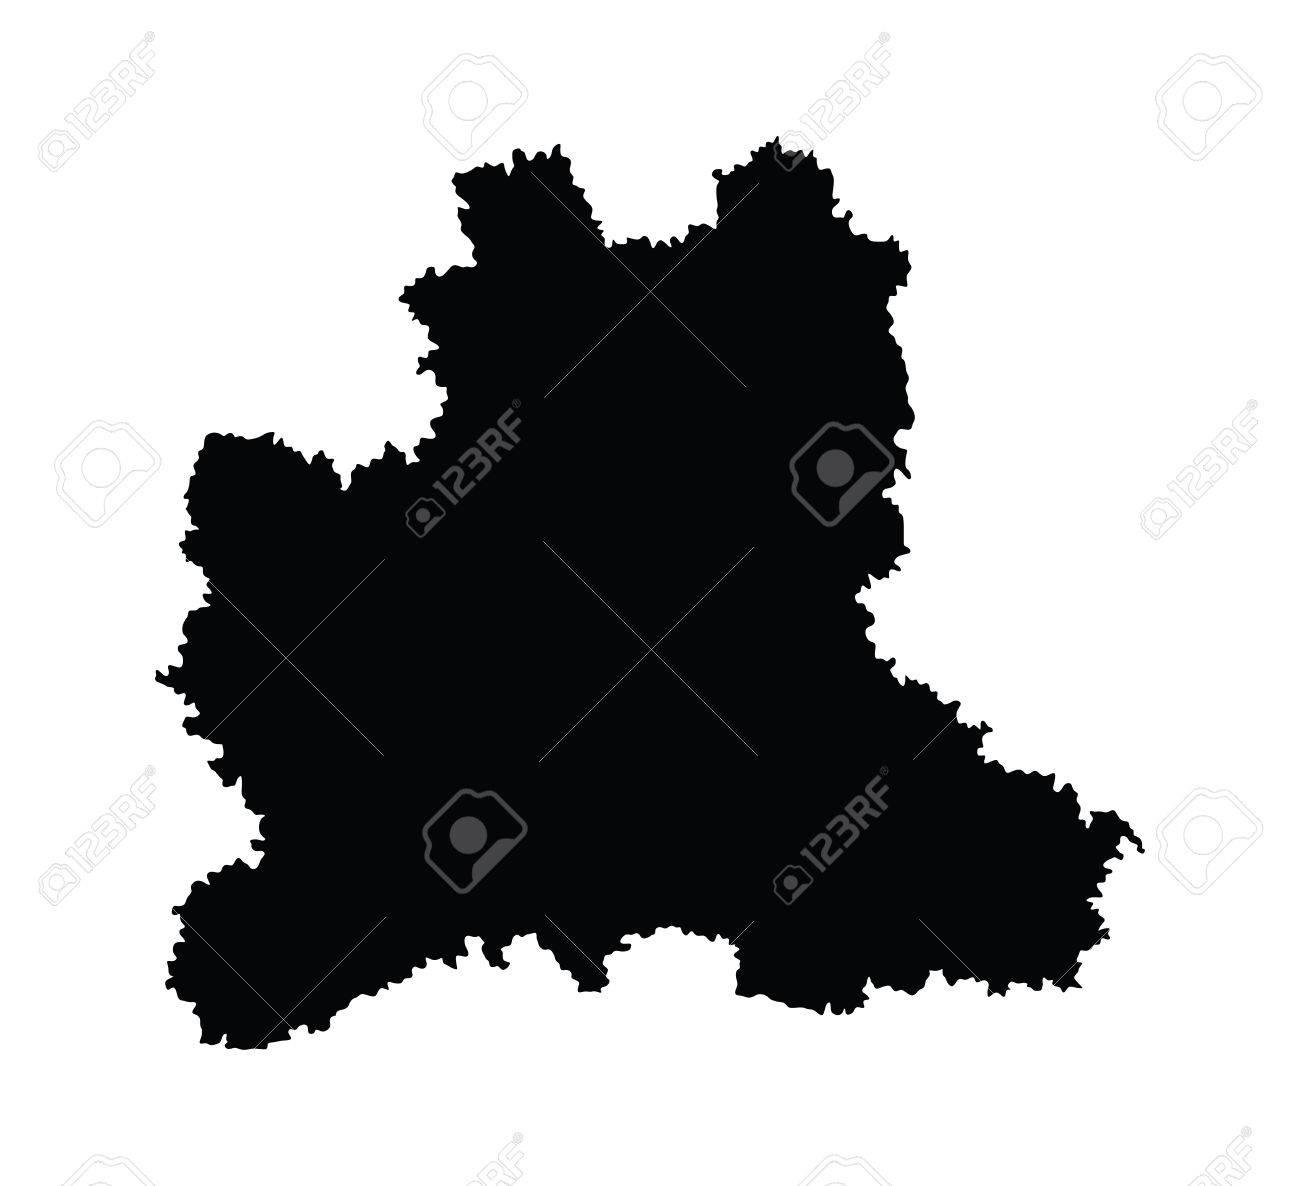 Lipetsk Oblast Vector Map Isolated On White Background High